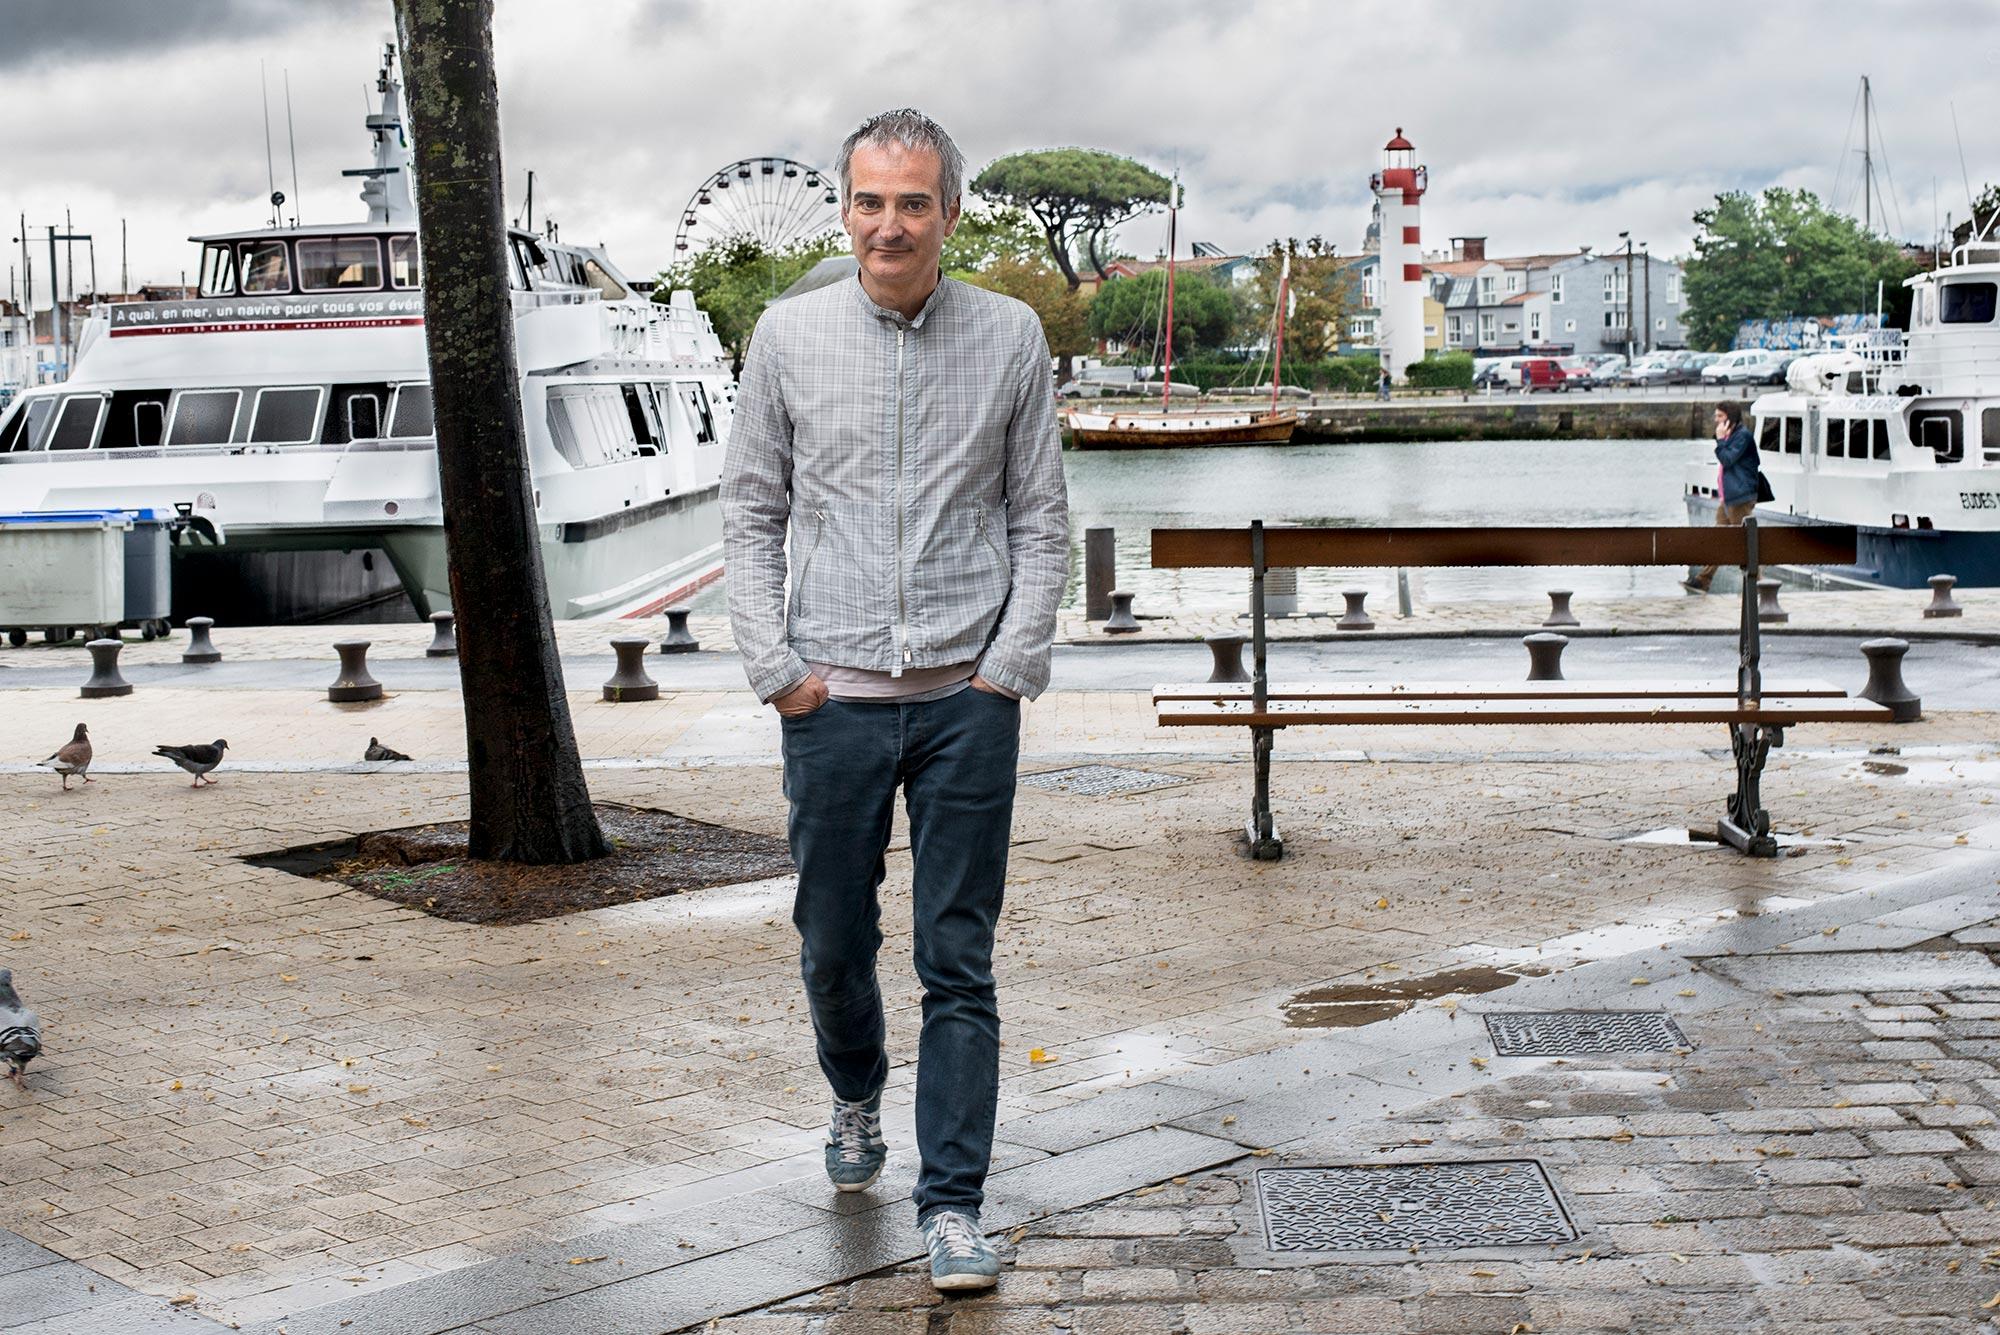 Olivier Assayas. Cinéaste